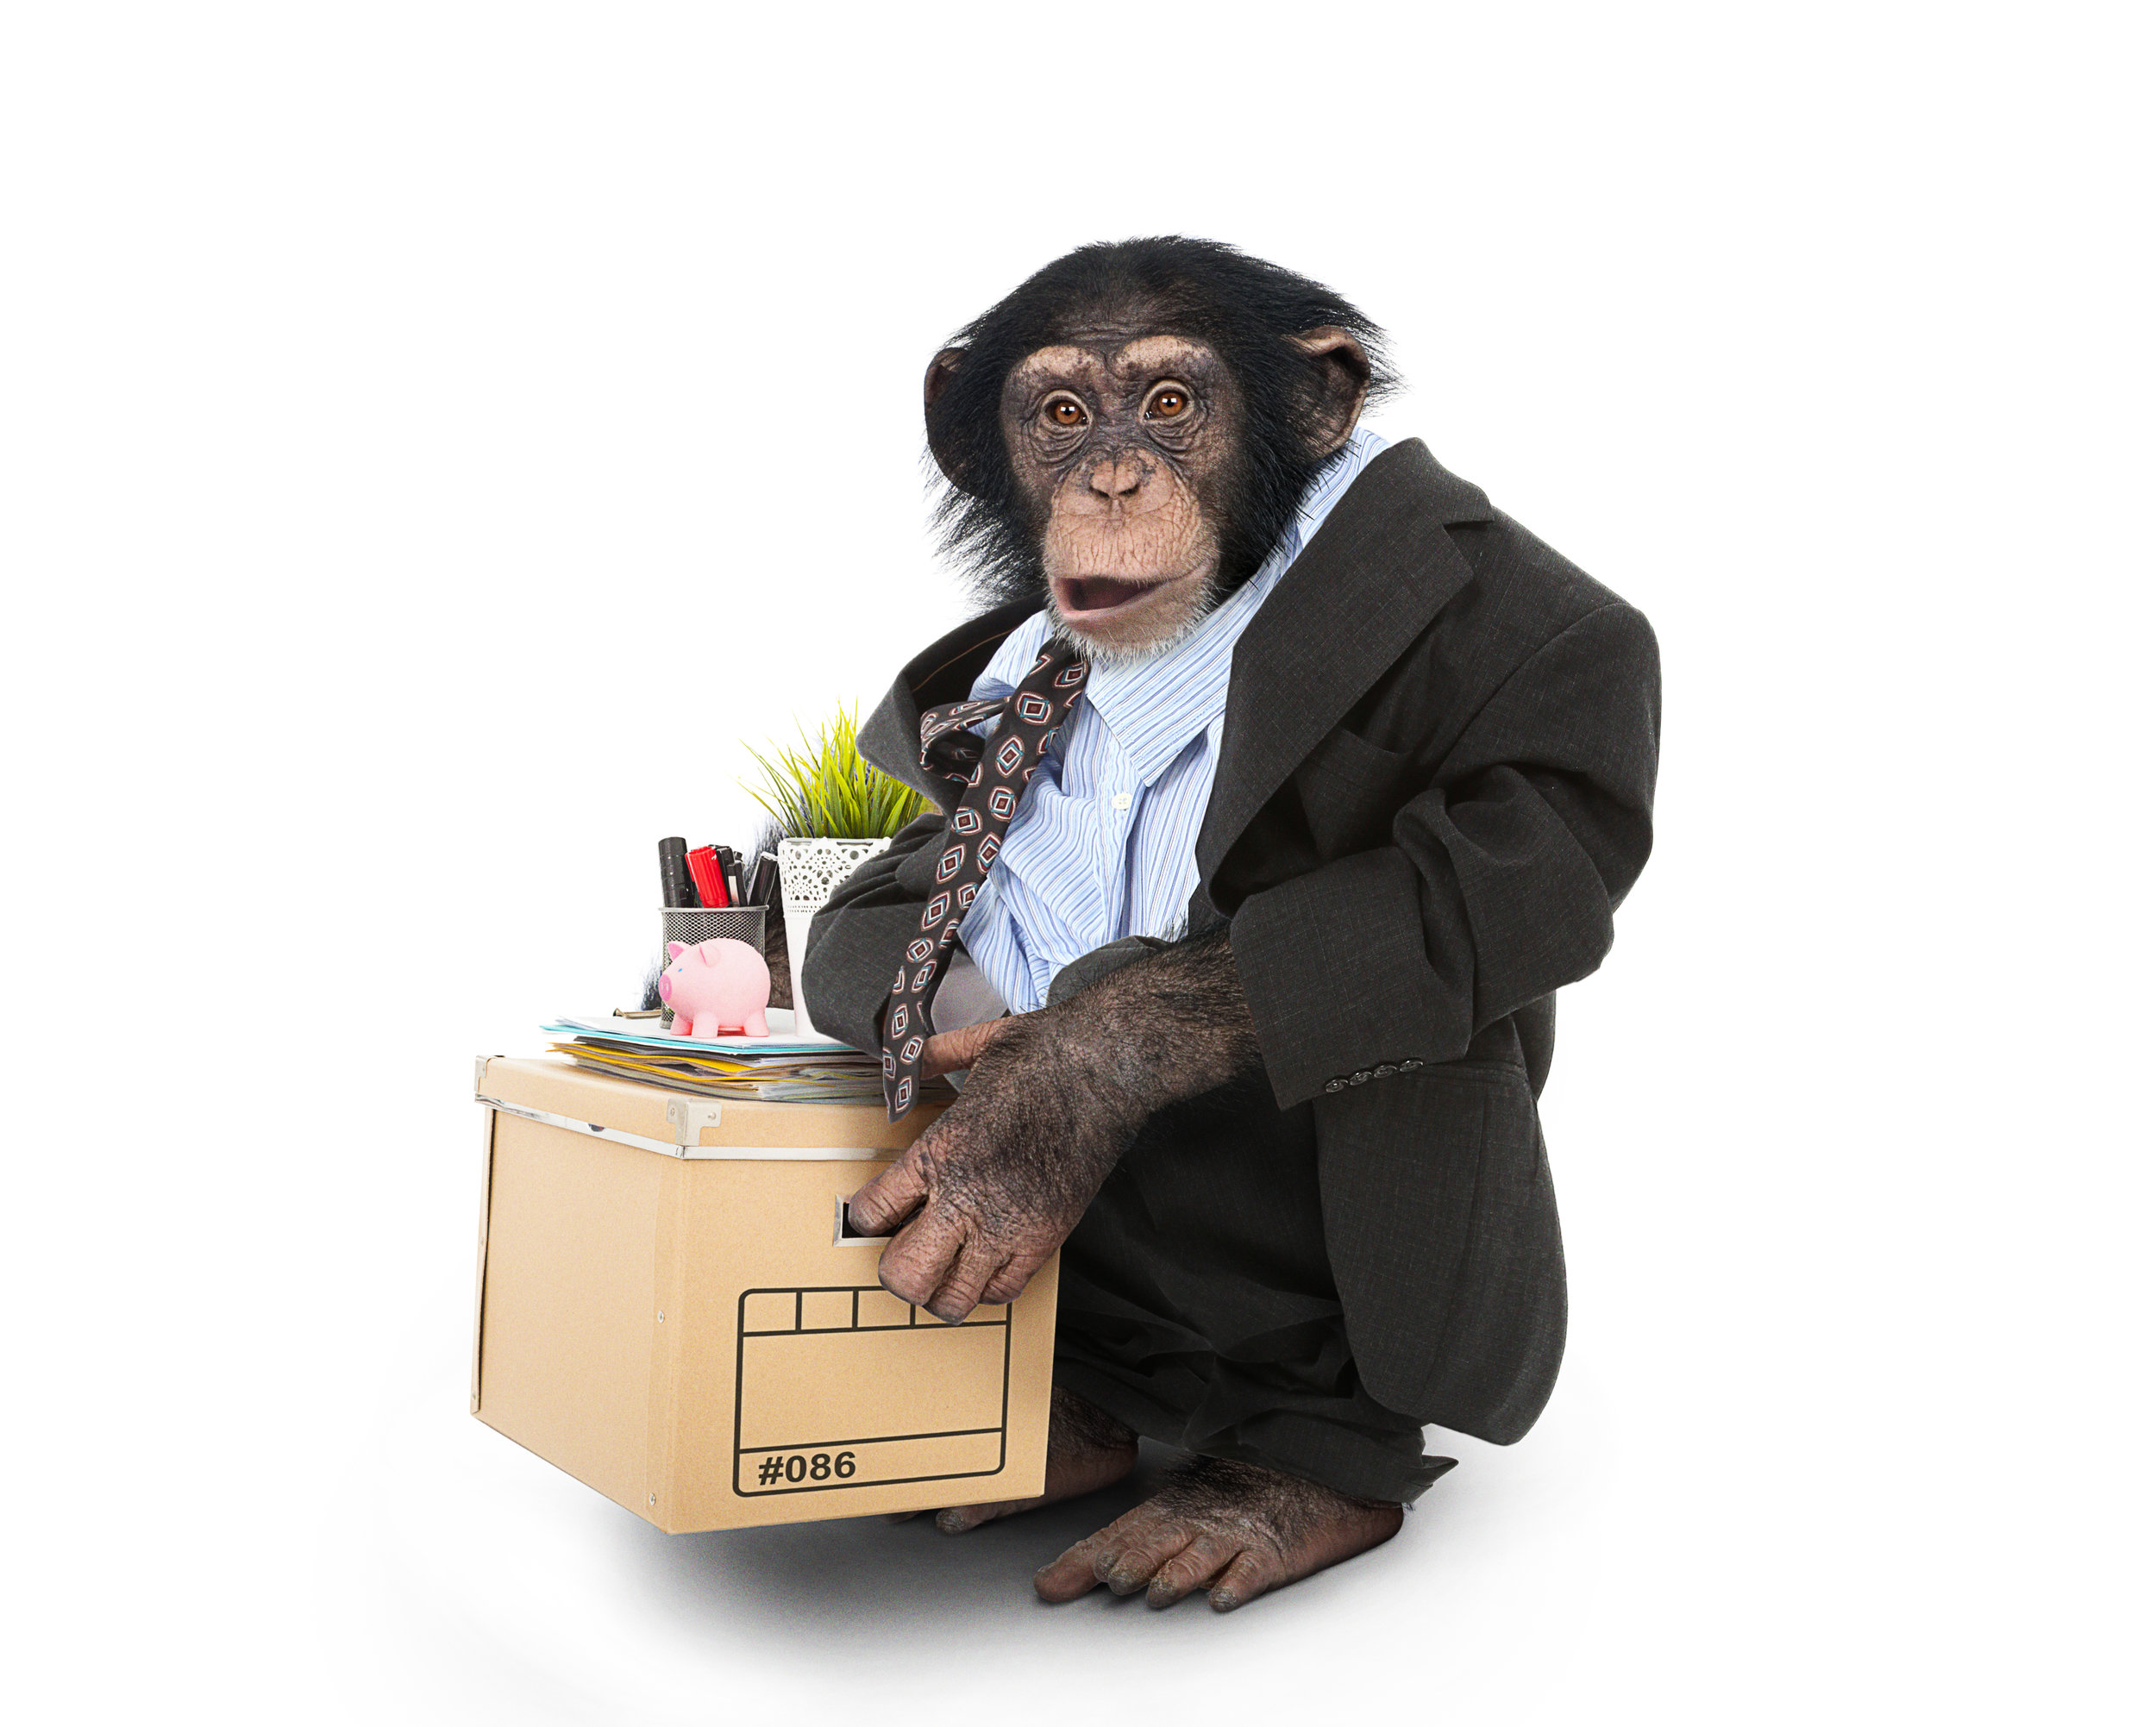 Chimp_Suit_01.jpg